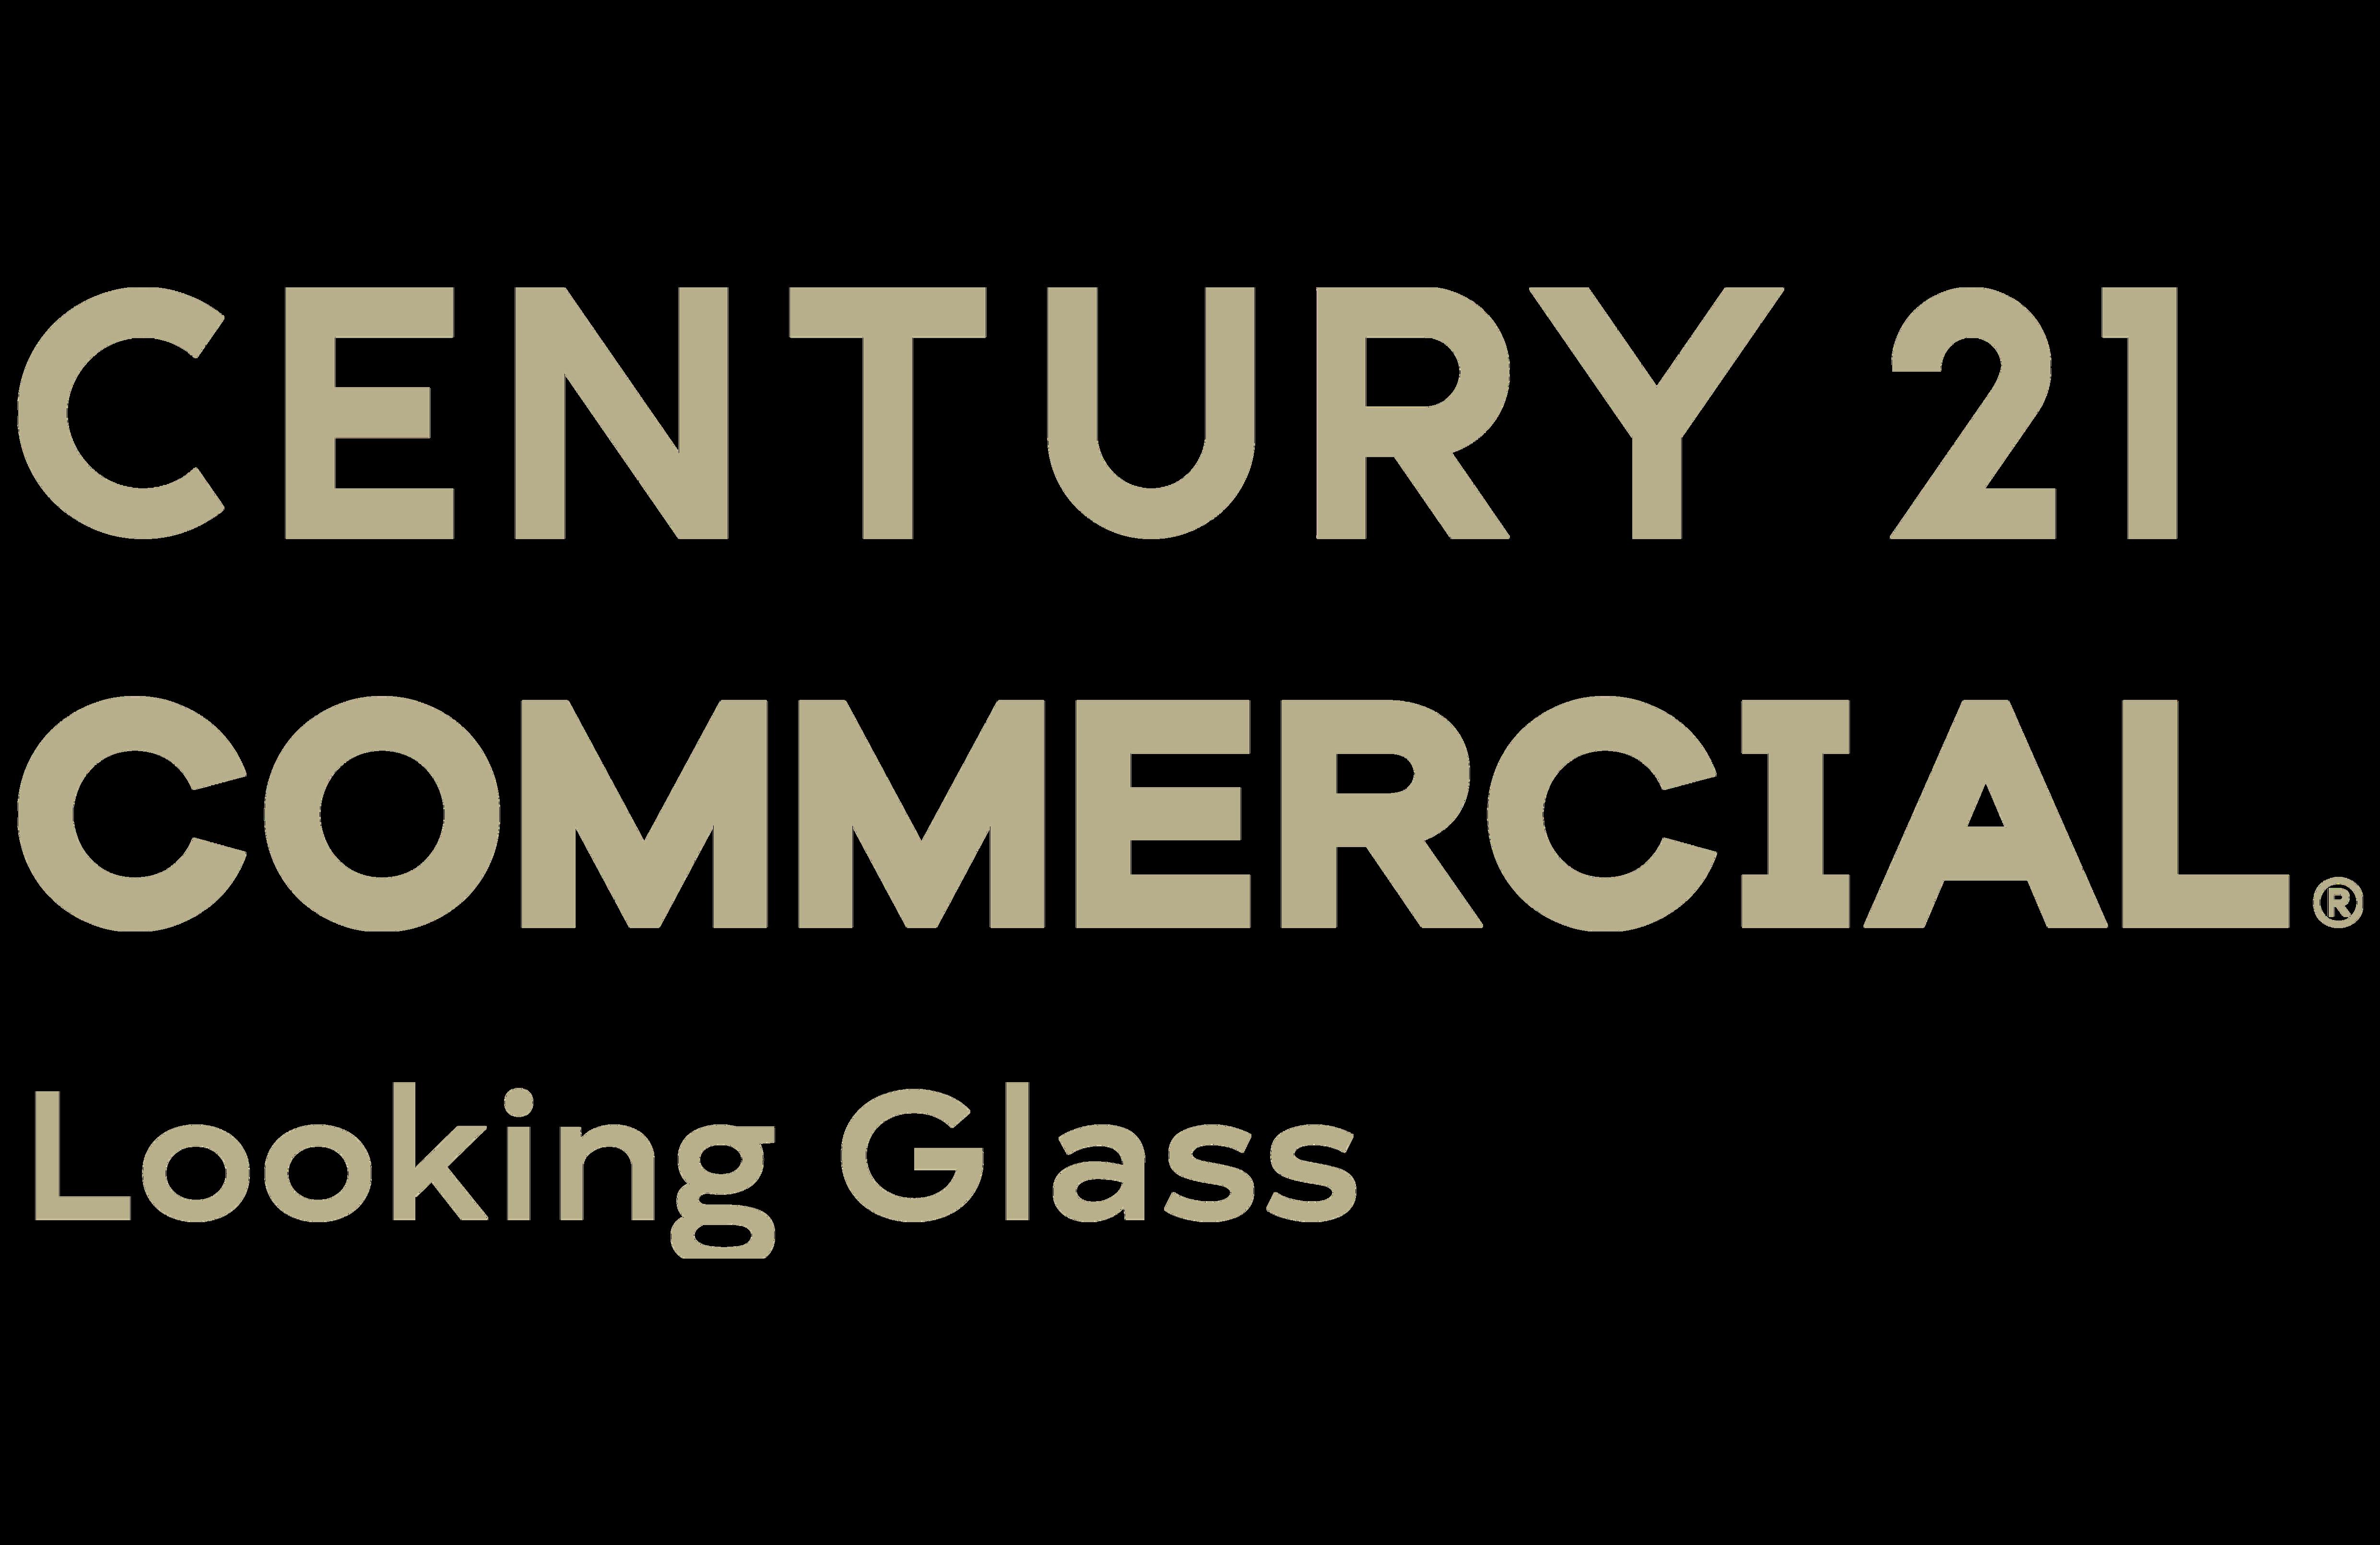 CENTURY 21 Looking Glass